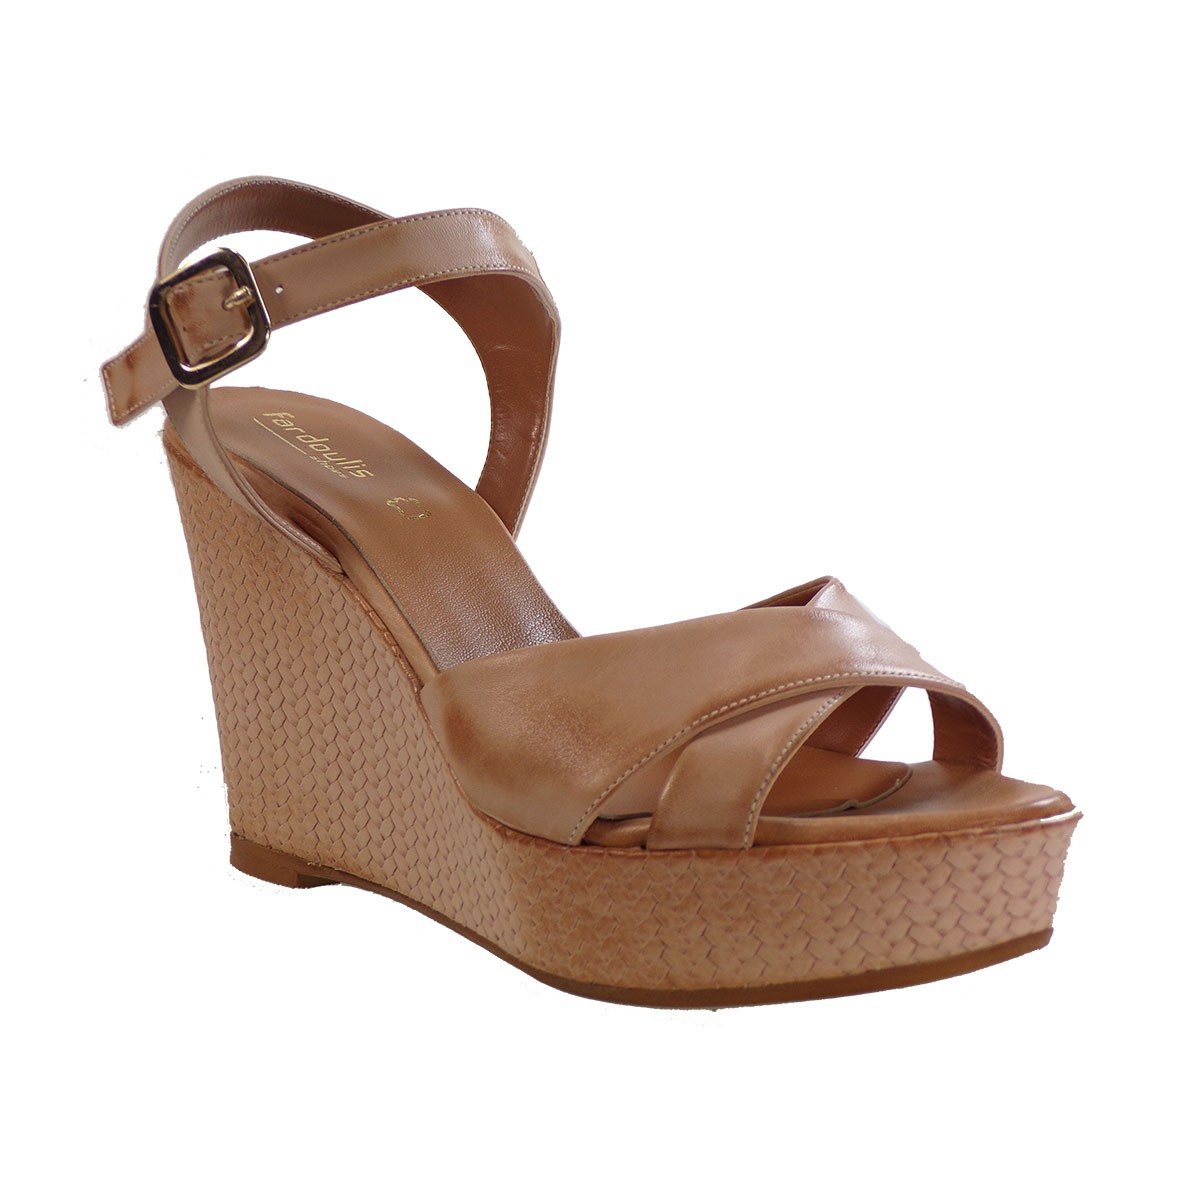 c2496252792 Fardoulis shoes Γυναικείες Πλατφόρμες Πέδιλα 26040 Nude Δέρμα